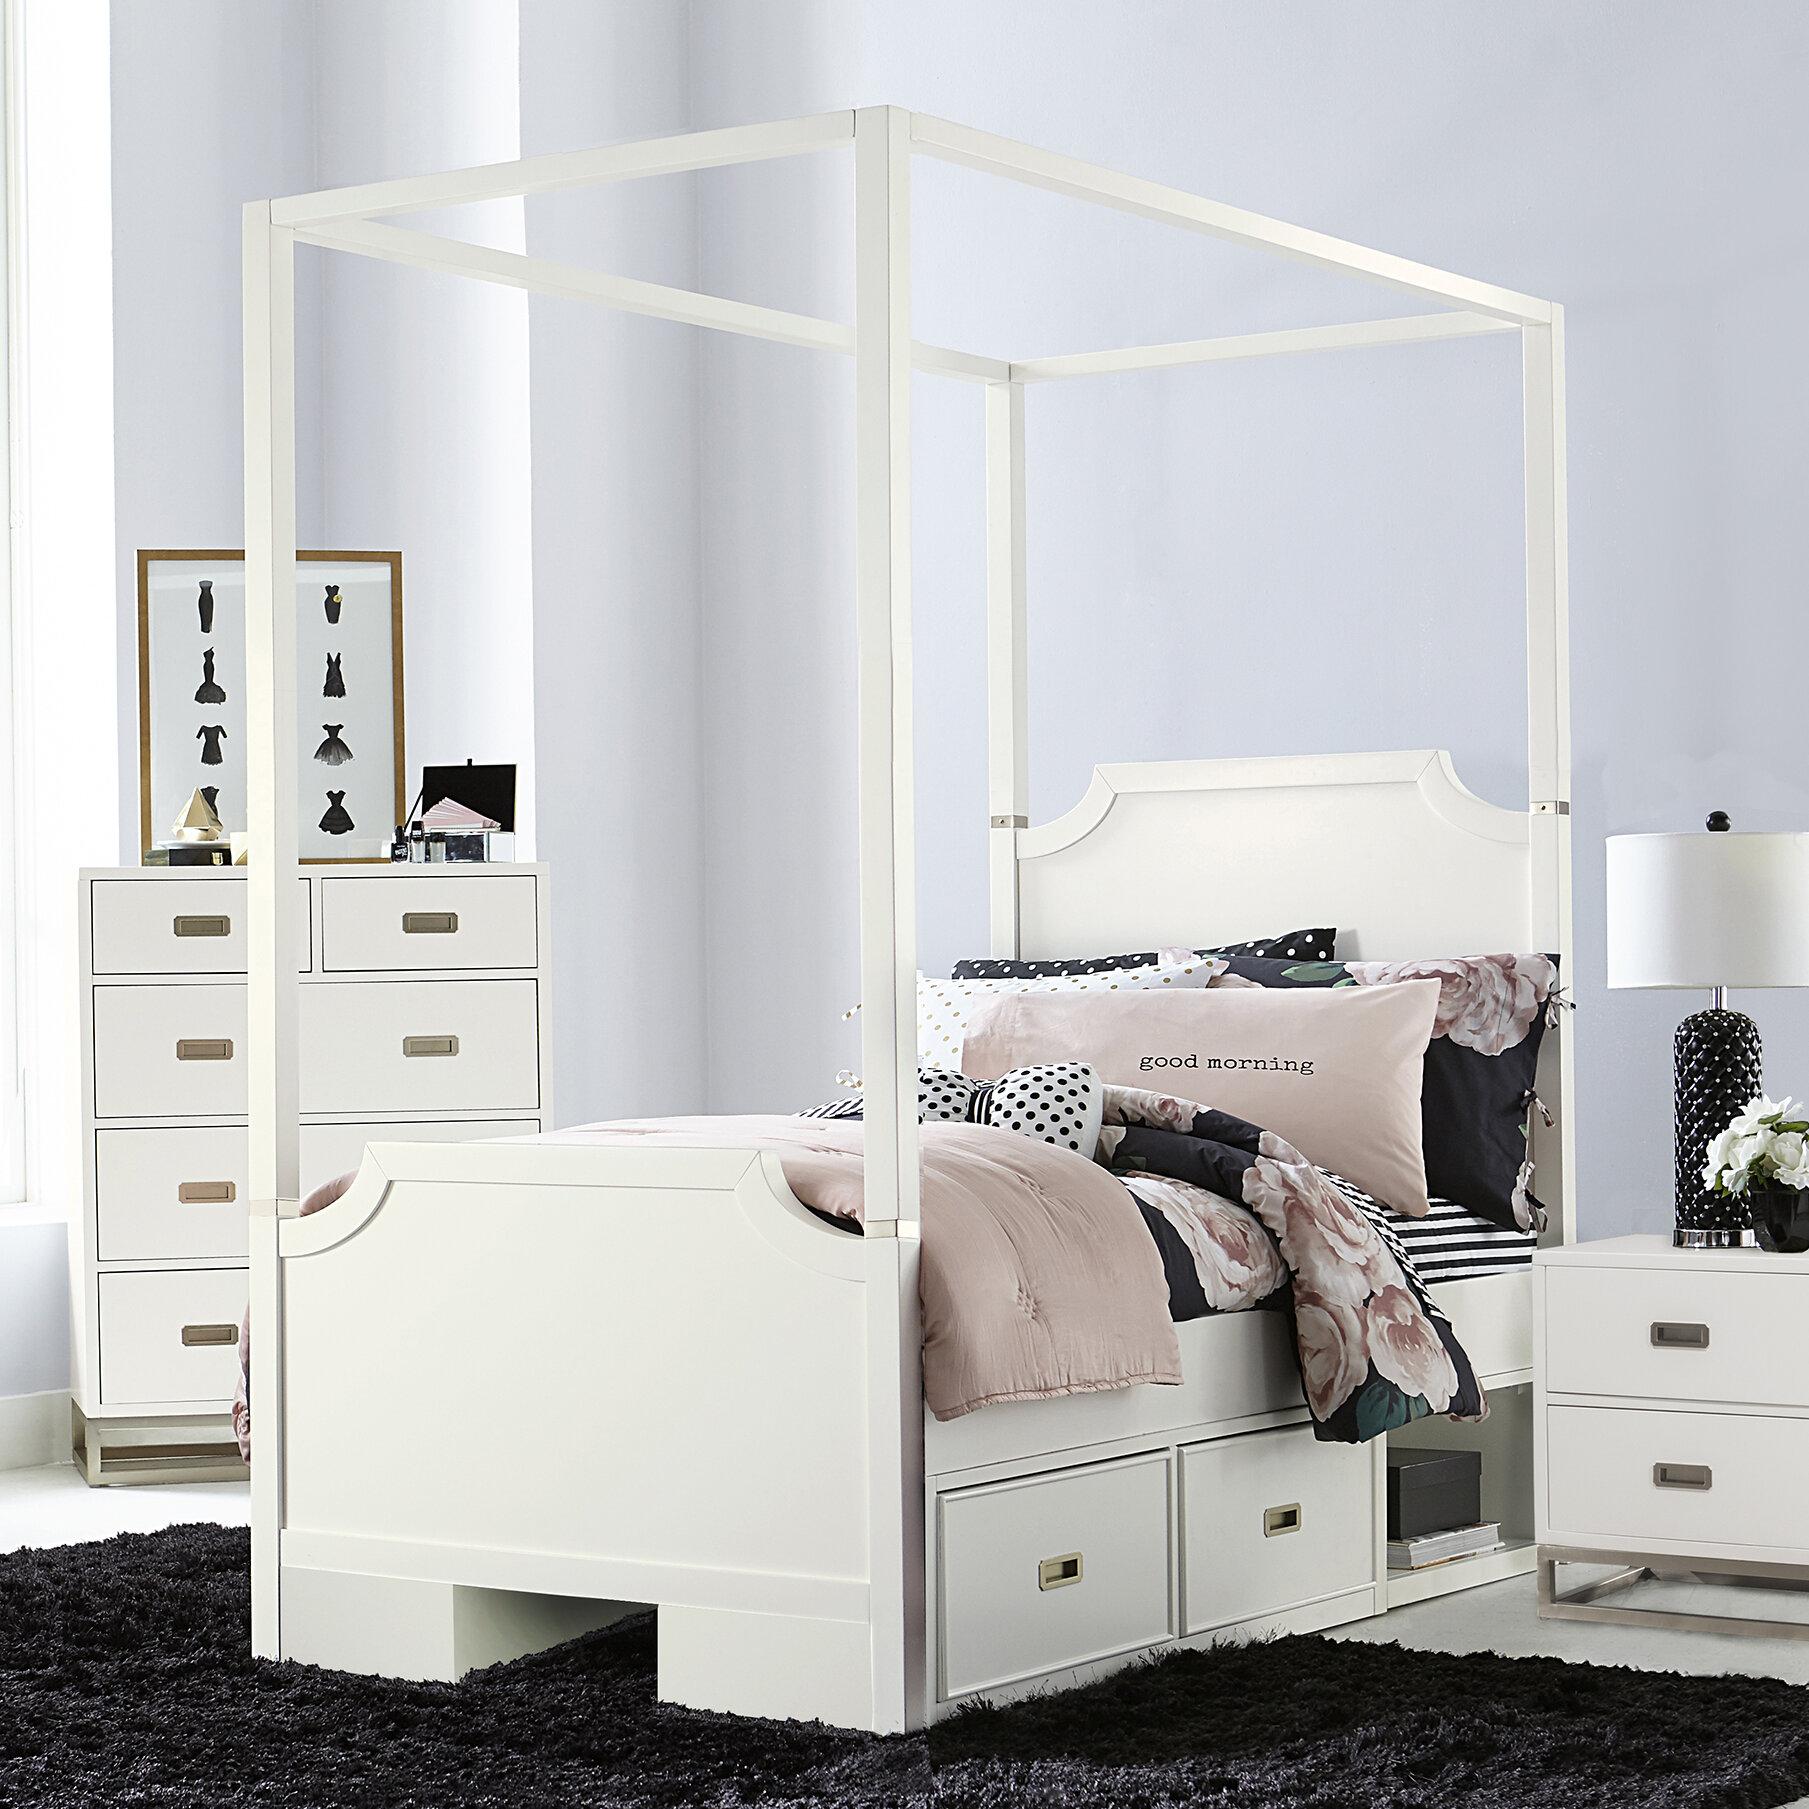 drawer products units camfix